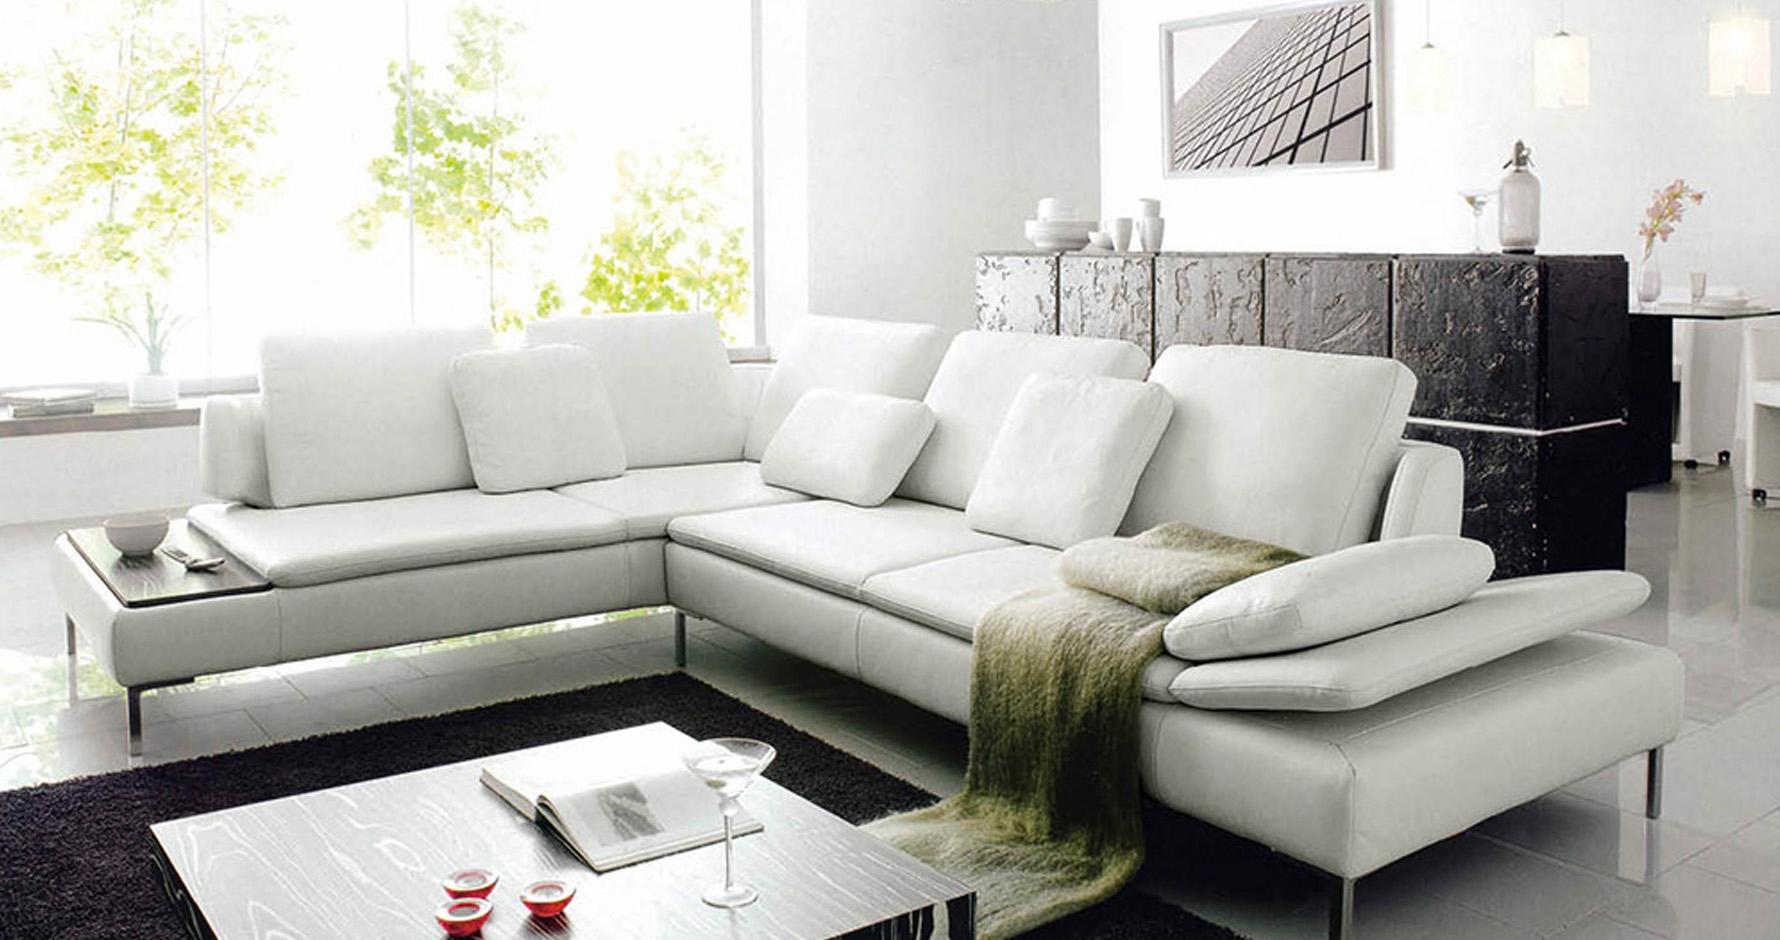 DECO IN PARIS Canape d angle design cuir blanc majestic